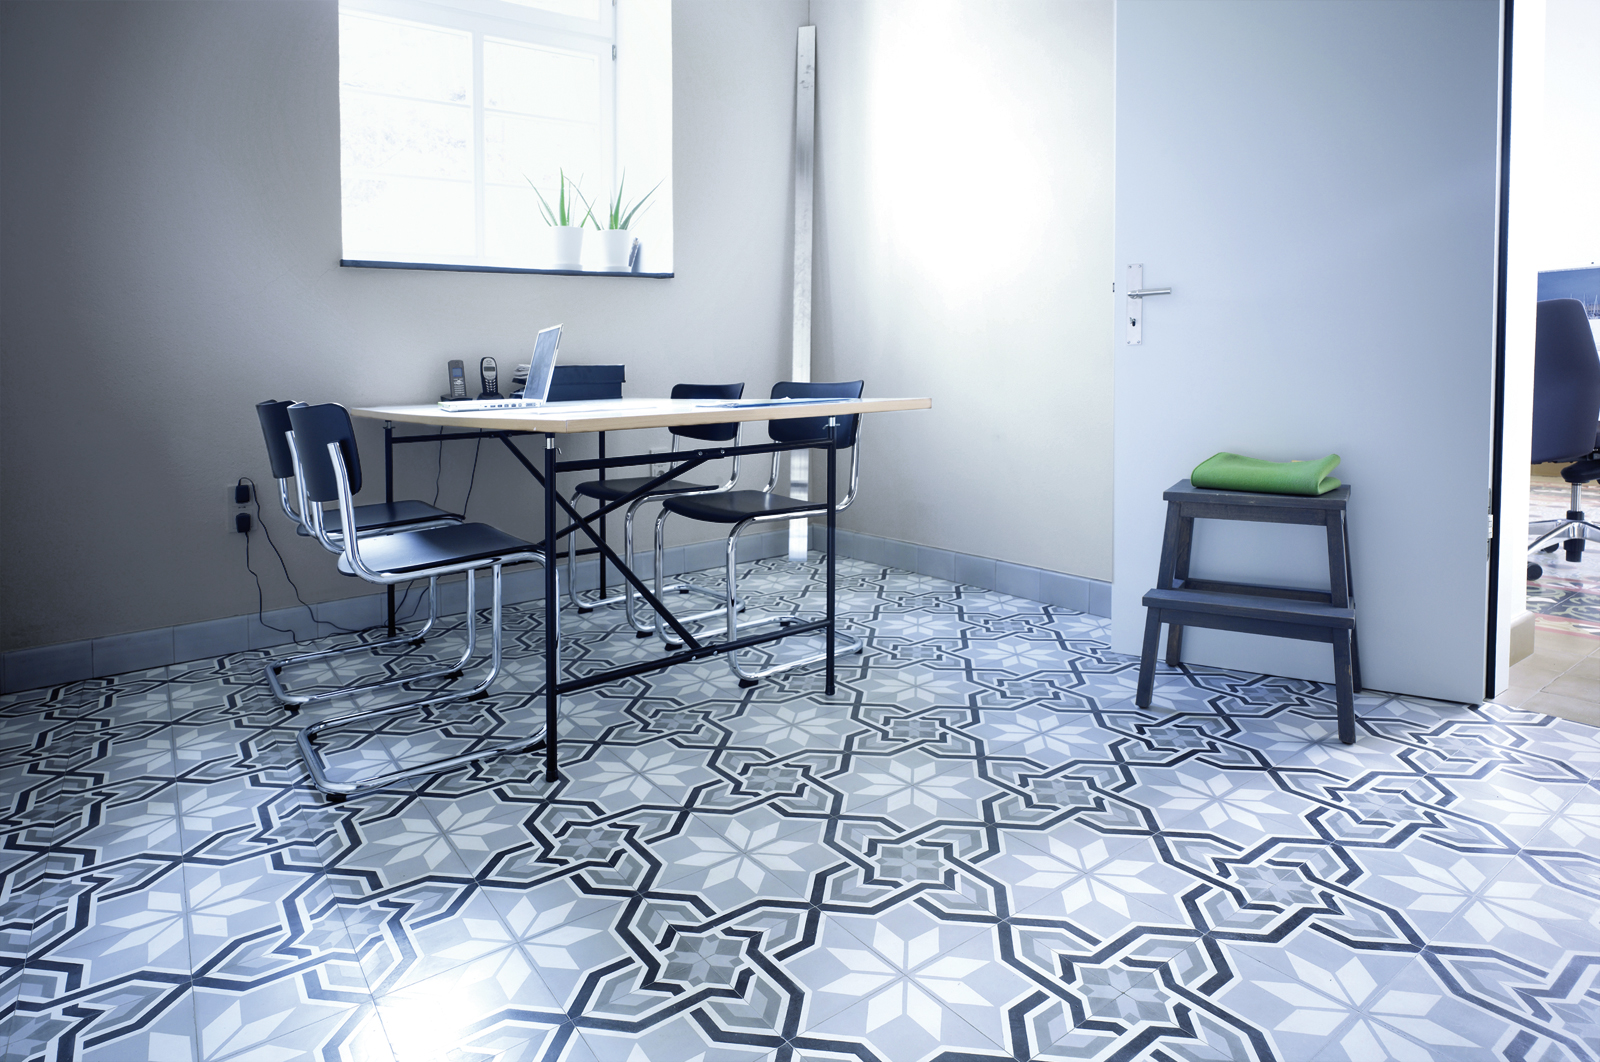 zementmosaikplatten-nummer-13252-buero-02-via-gmbh | 13252